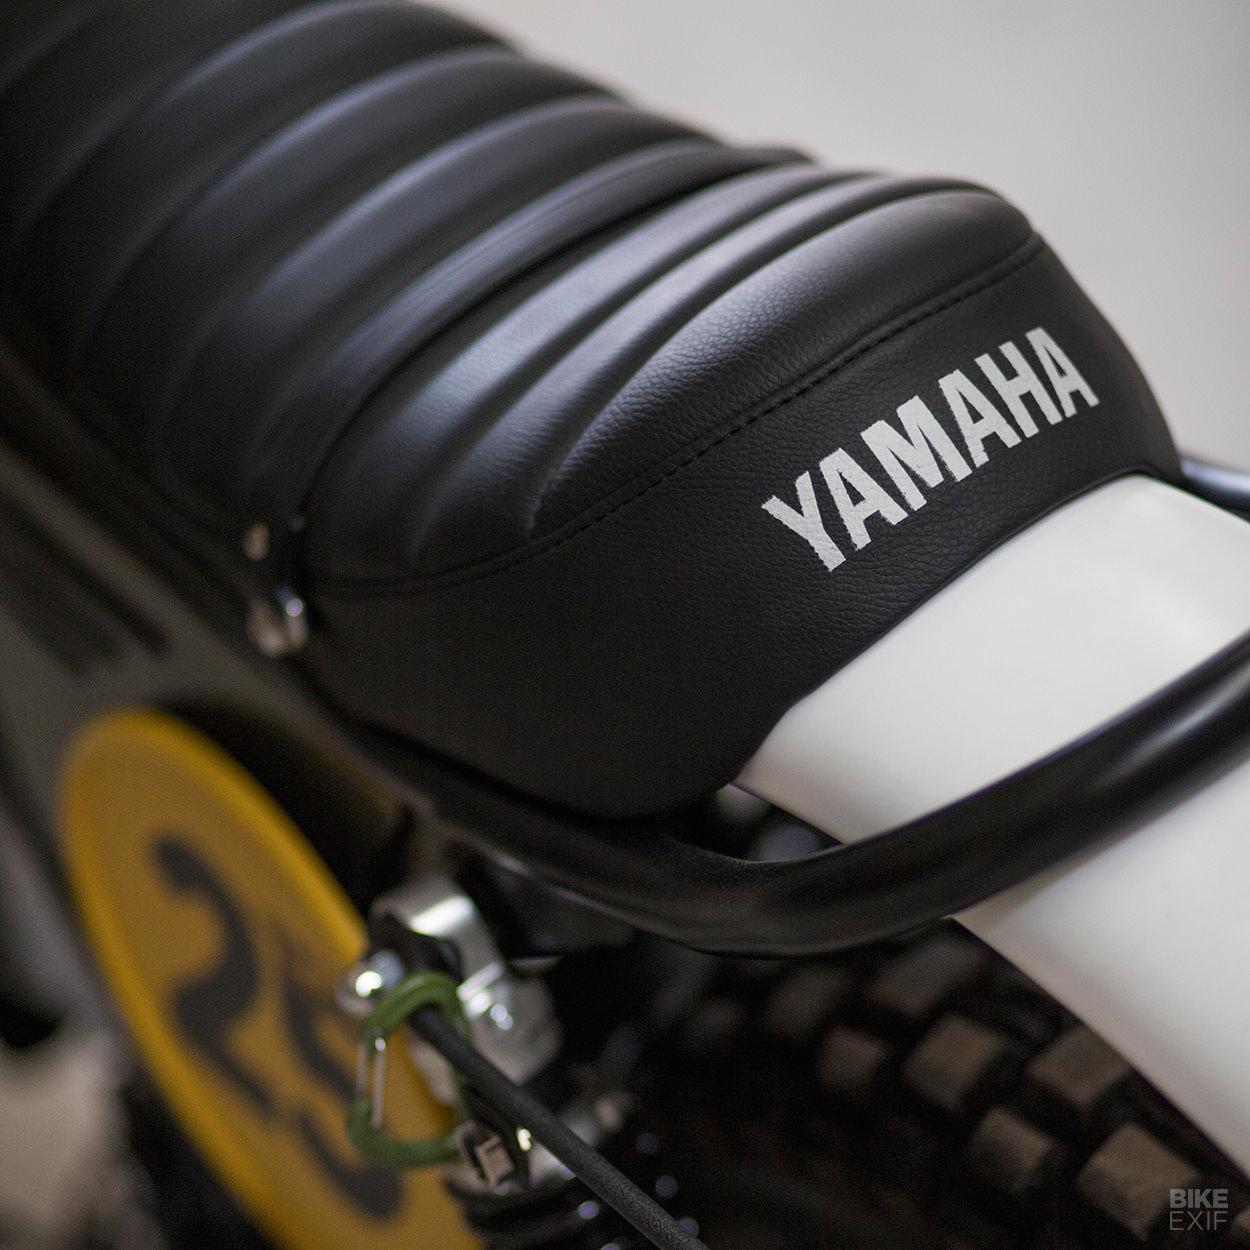 Yamaha Exciter SR250 scrambler by UFO Garage